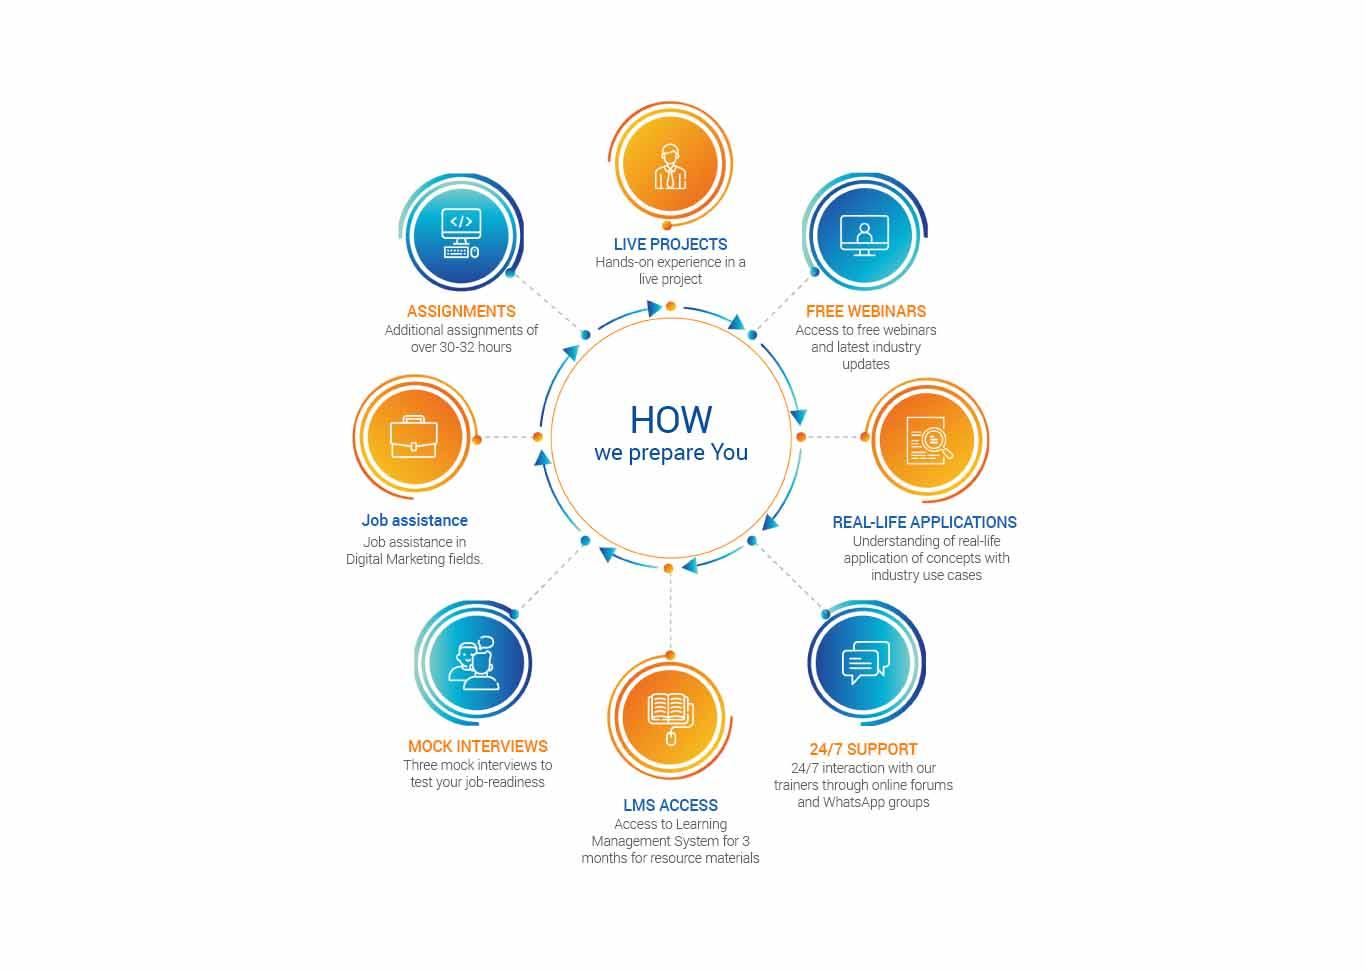 adavanced digital marketing course modules - 360digitmg